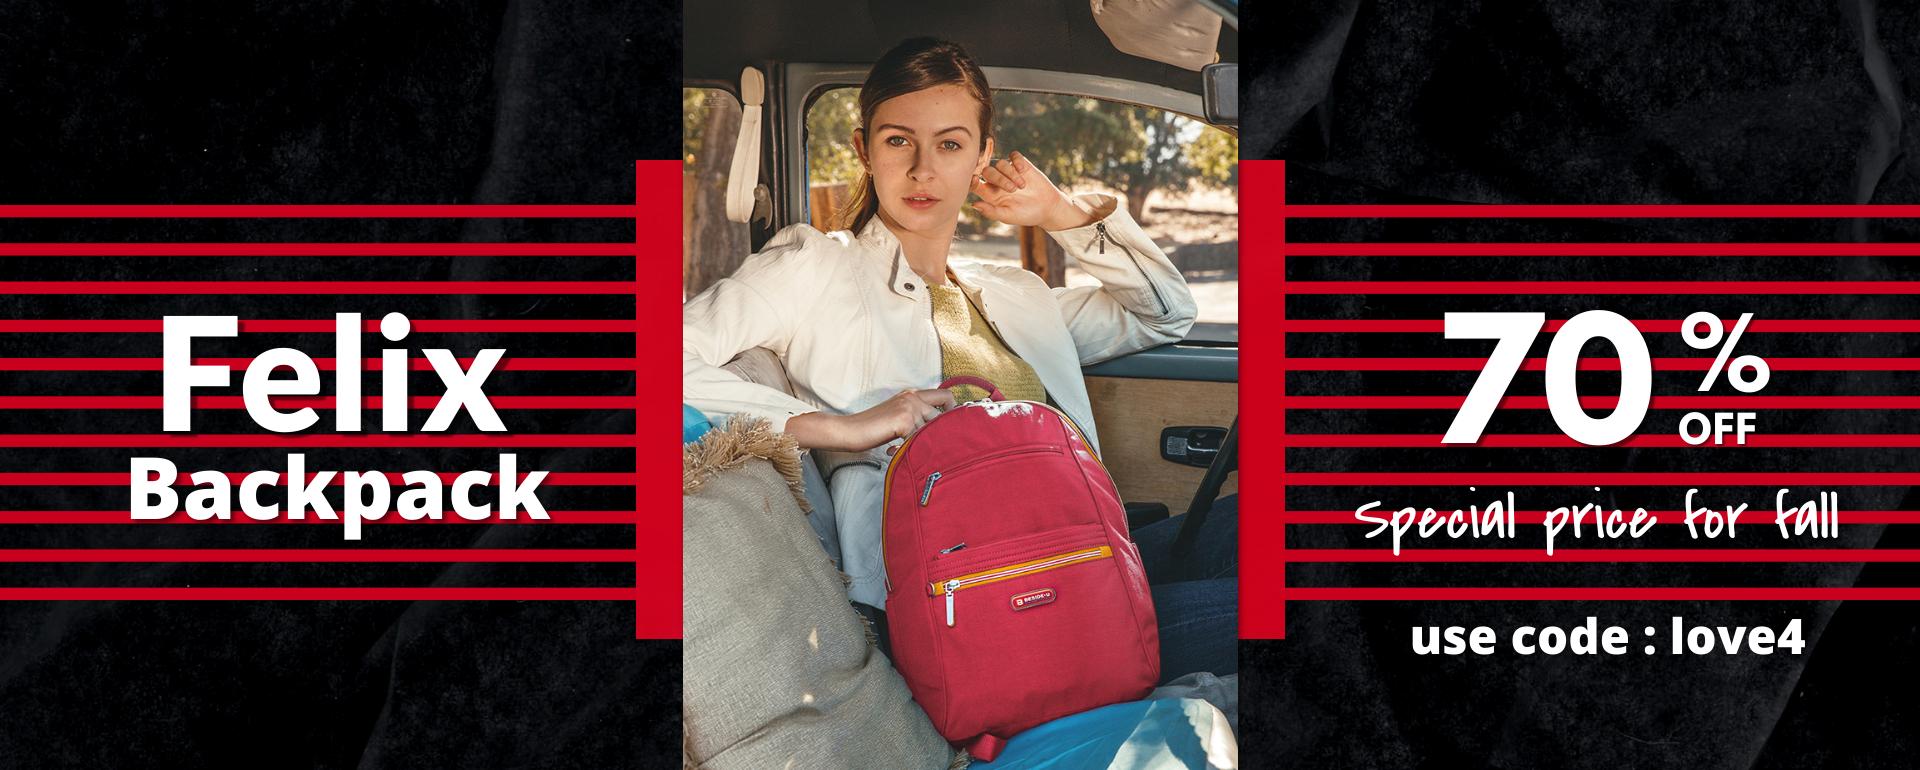 beside-u BFYT10-299 Felix Heart Red Backpack Handbag purses fashion handbags designer bags Banner 1920x770